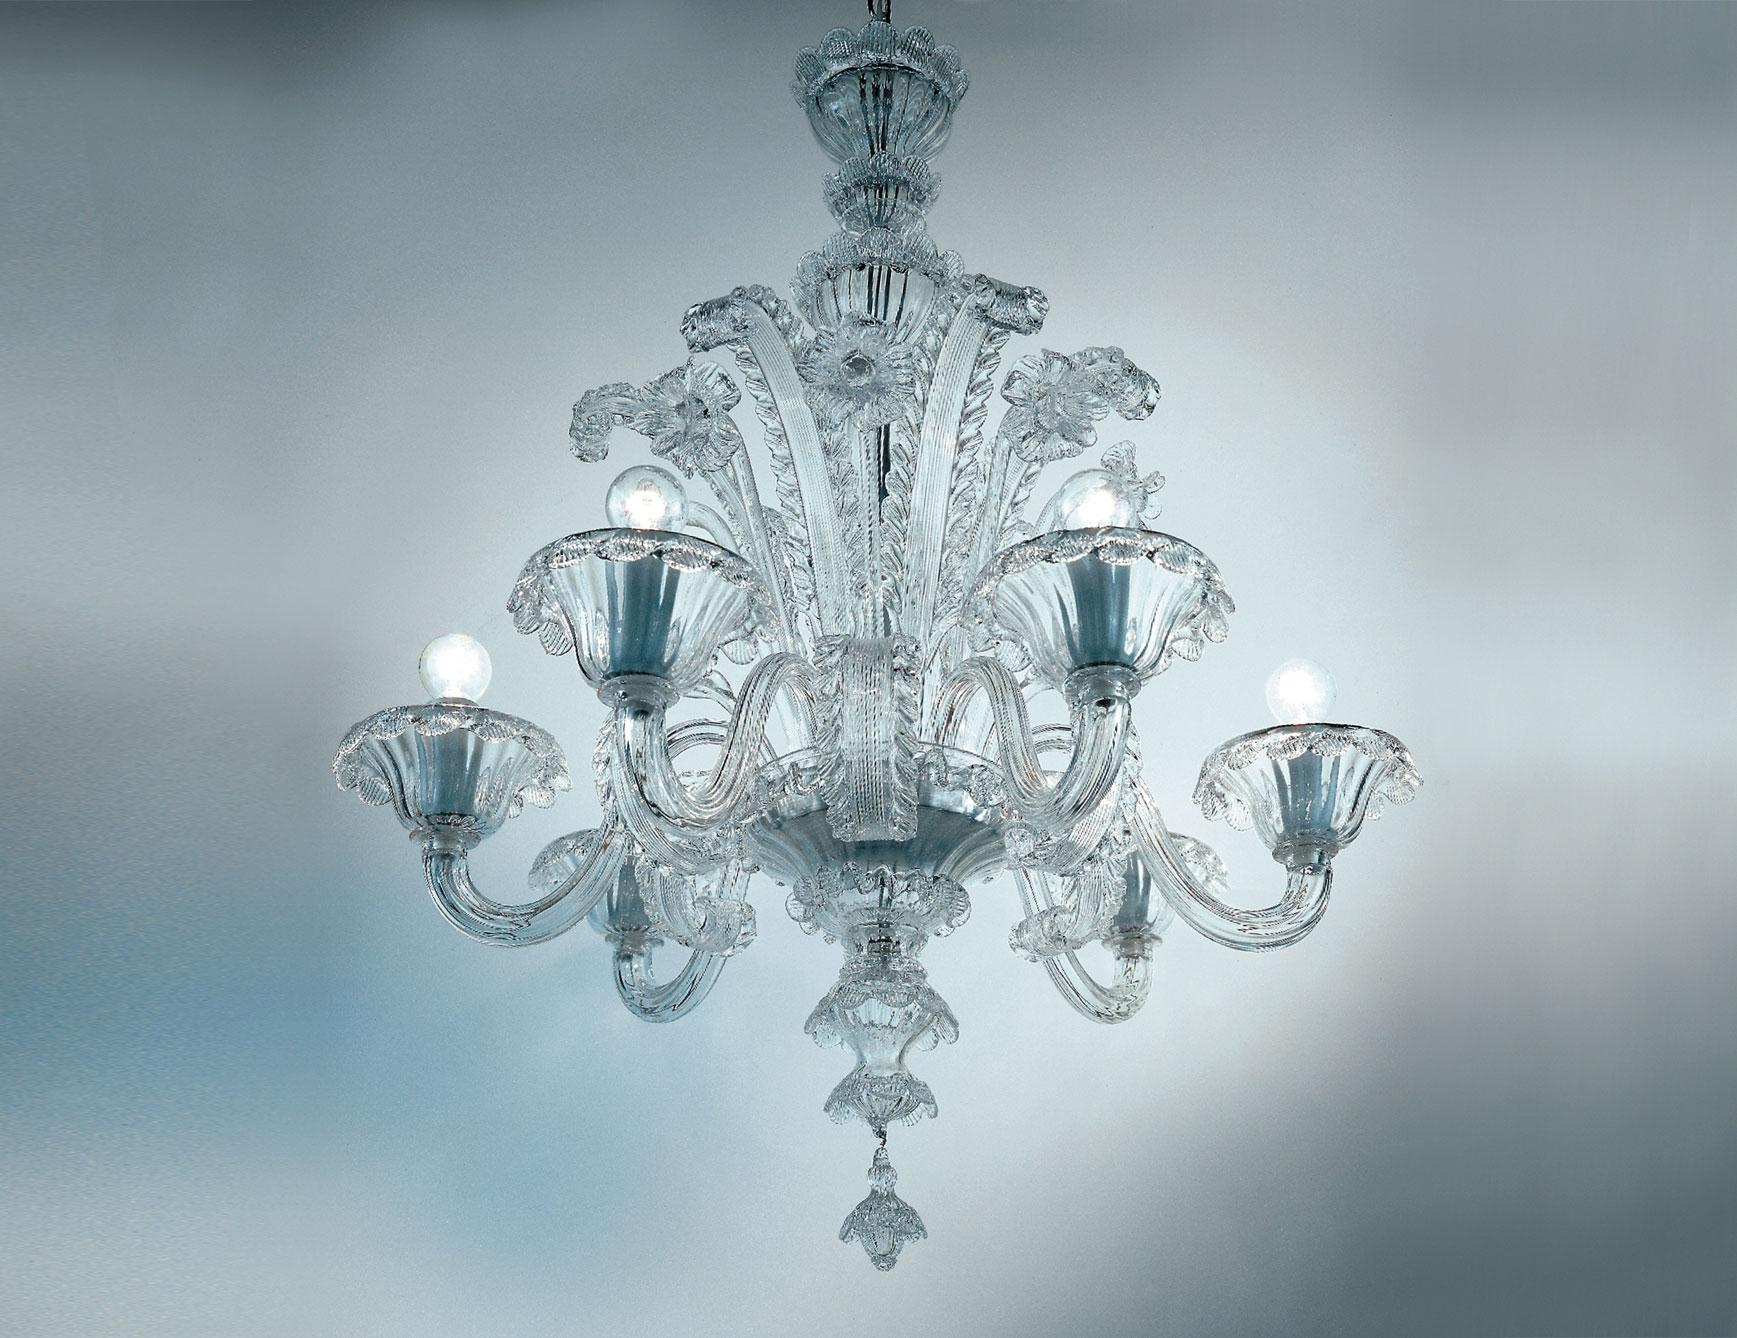 Nella Vetrina Veneziani Av Mazzega Dolfin 8004 06 Venetian Within Glass Chandeliers (Image 14 of 15)